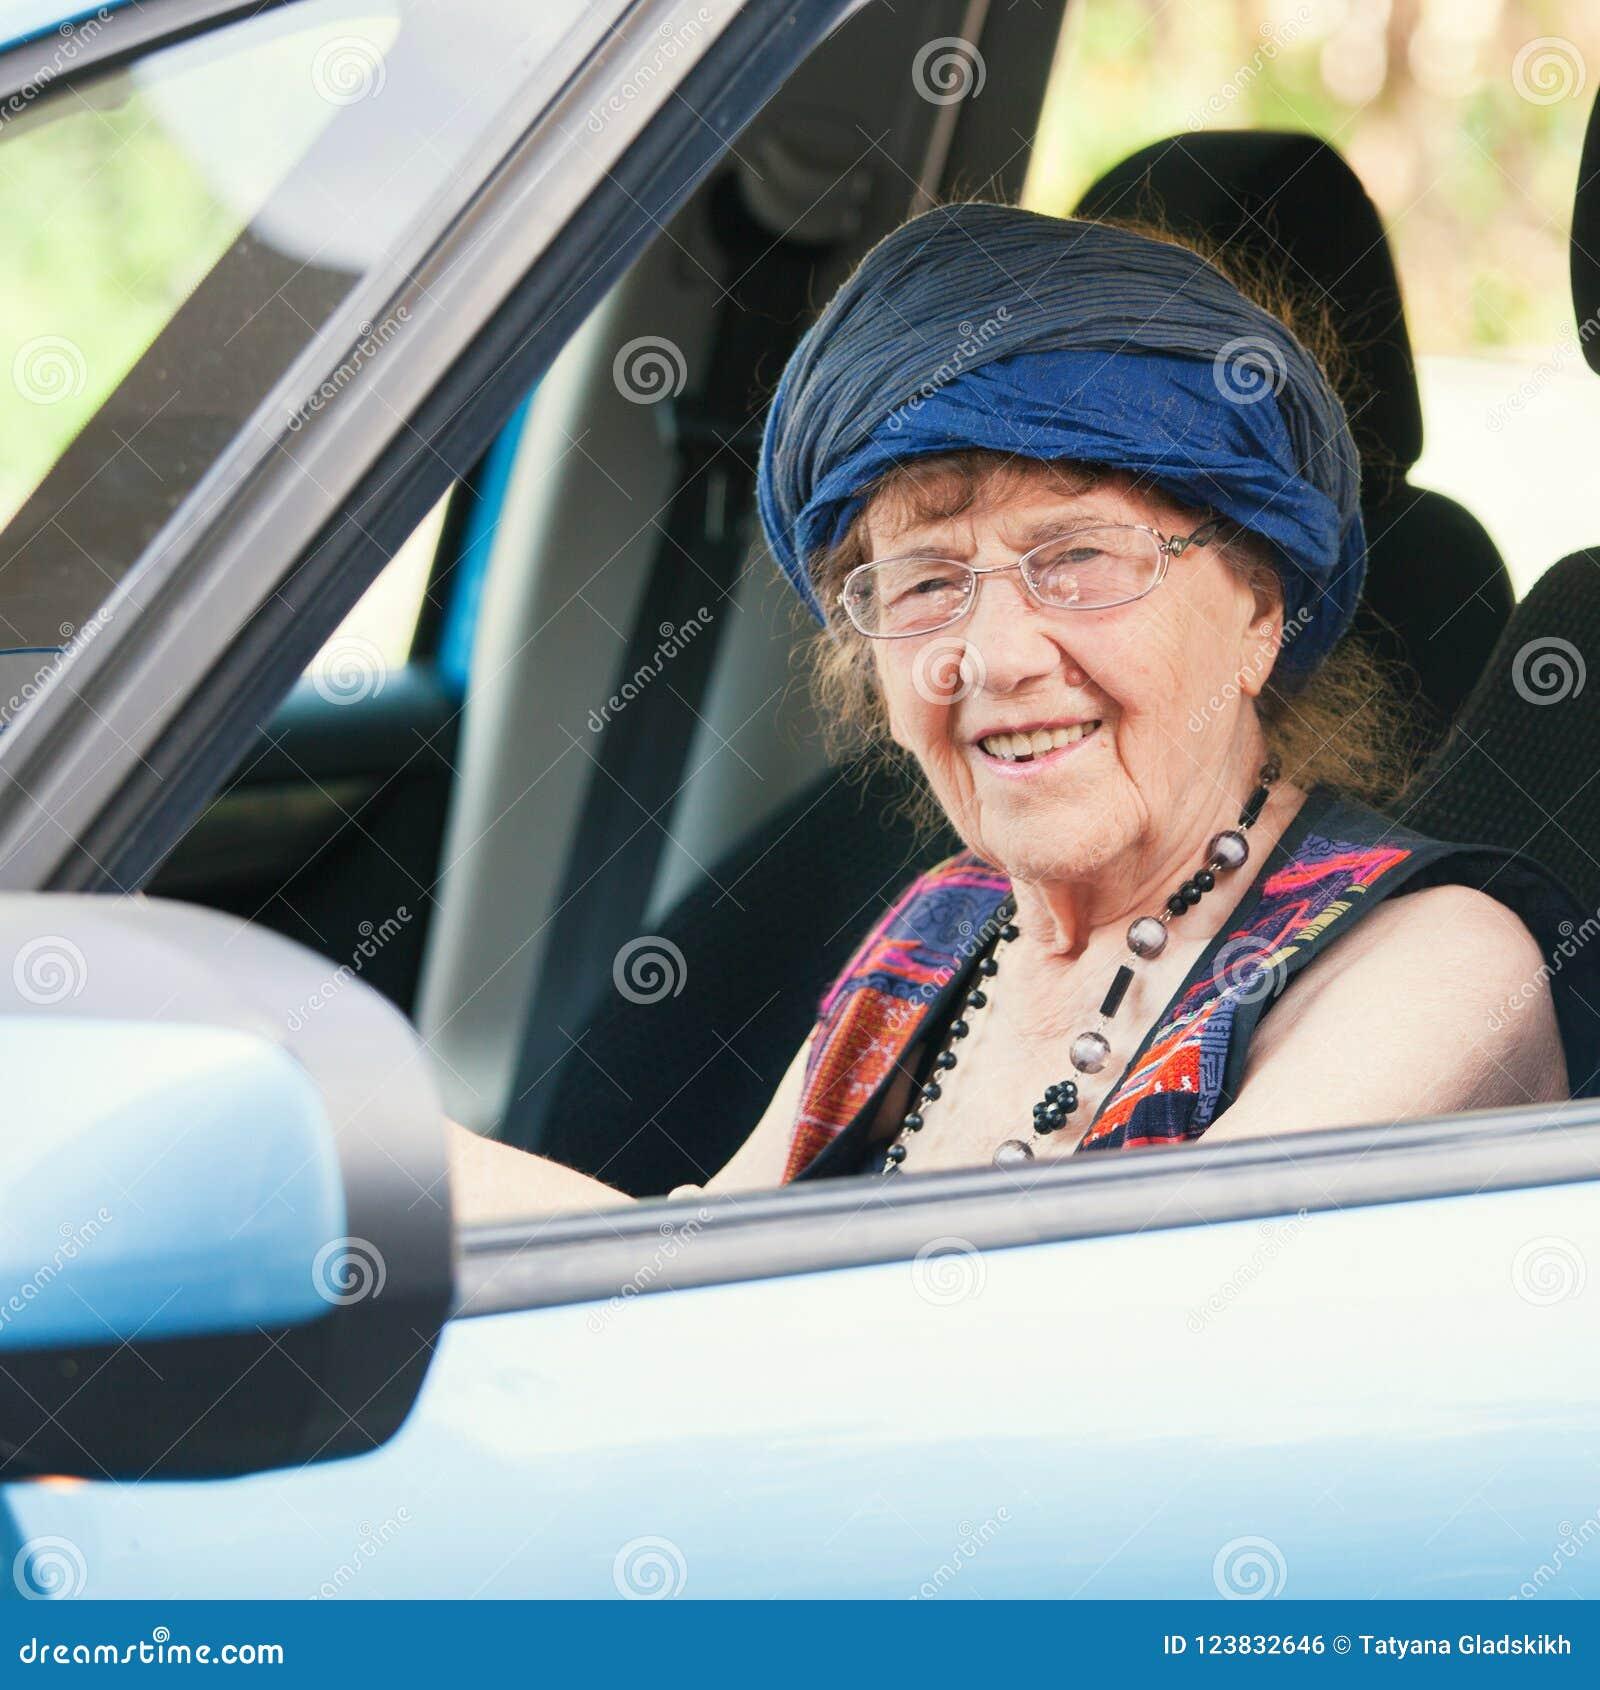 Car Stock Photos: Royalty Free Stock Images